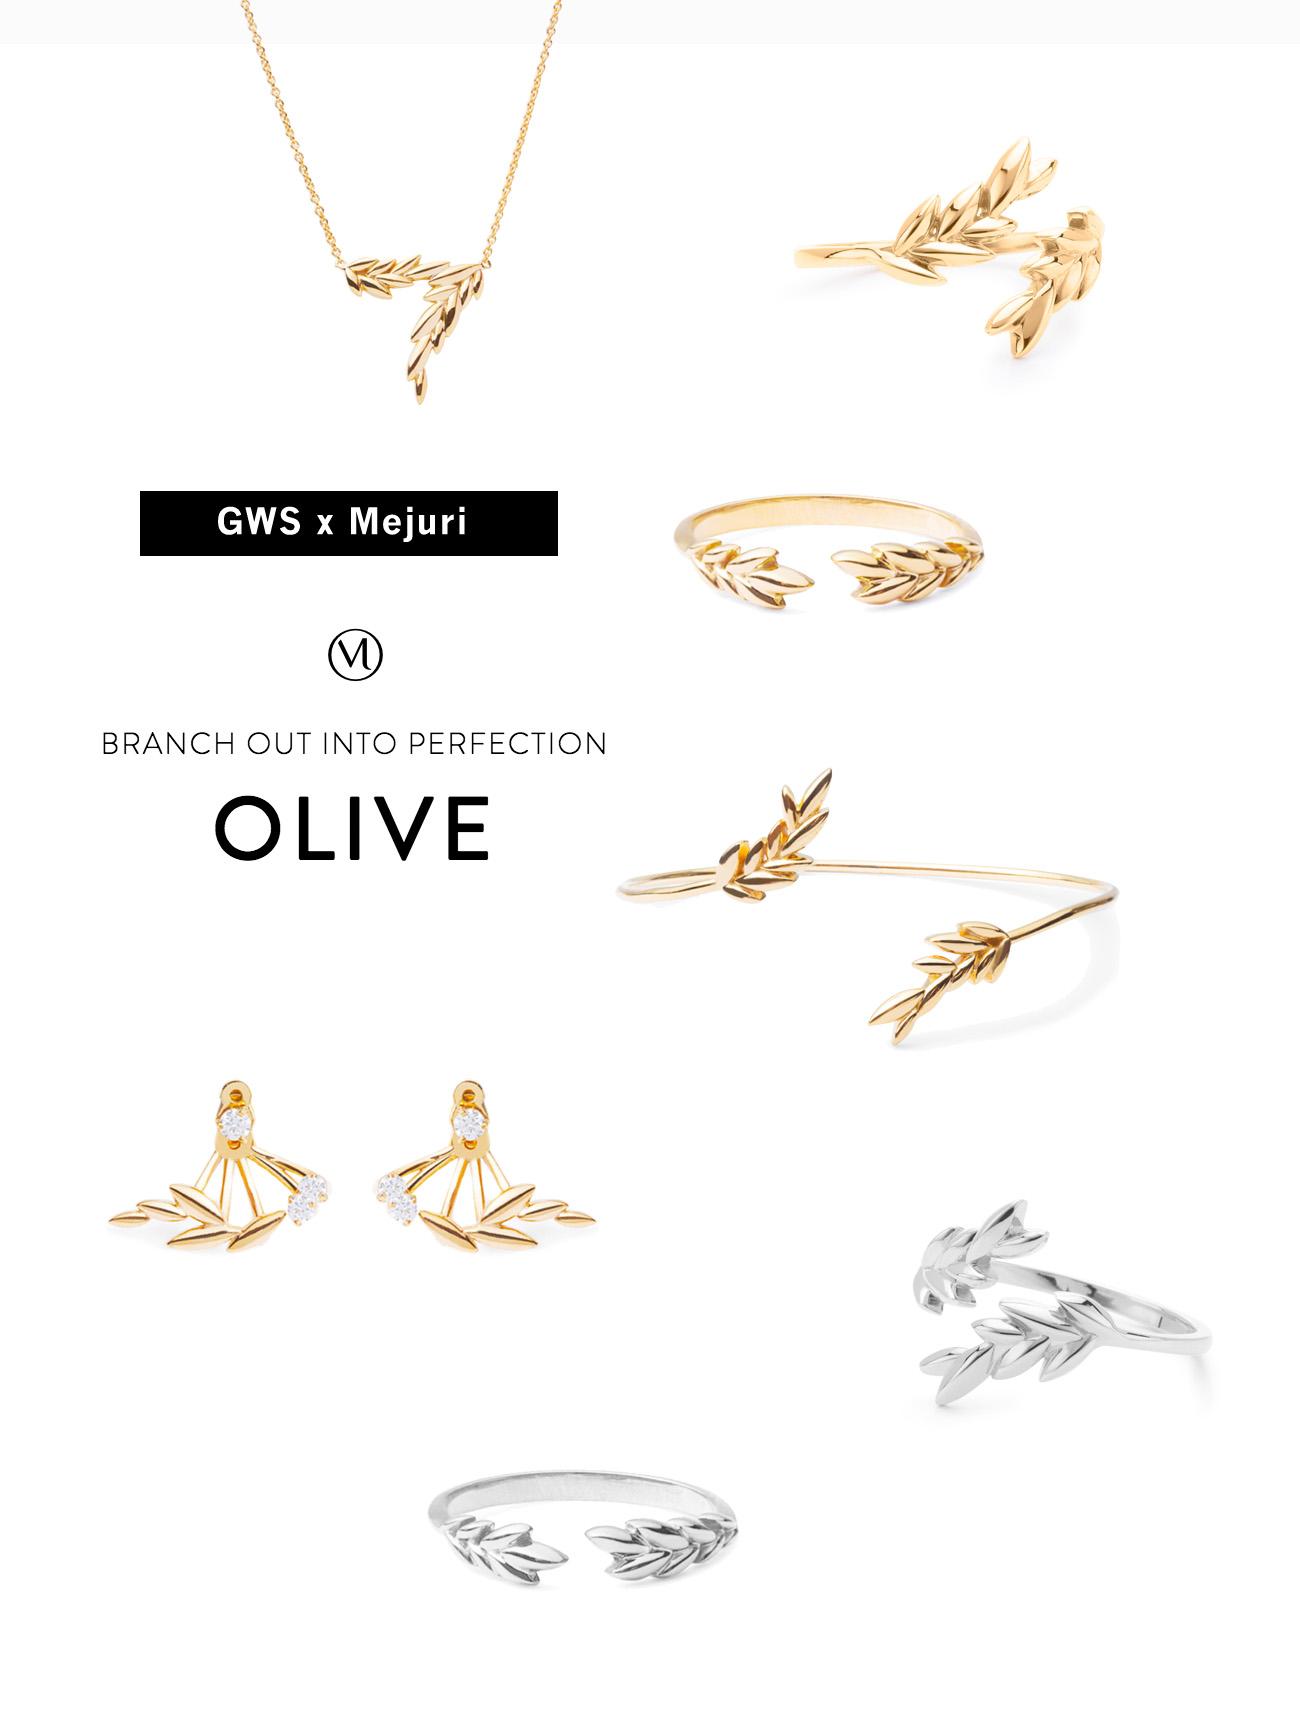 GWS x Mejuri Jewelry collection